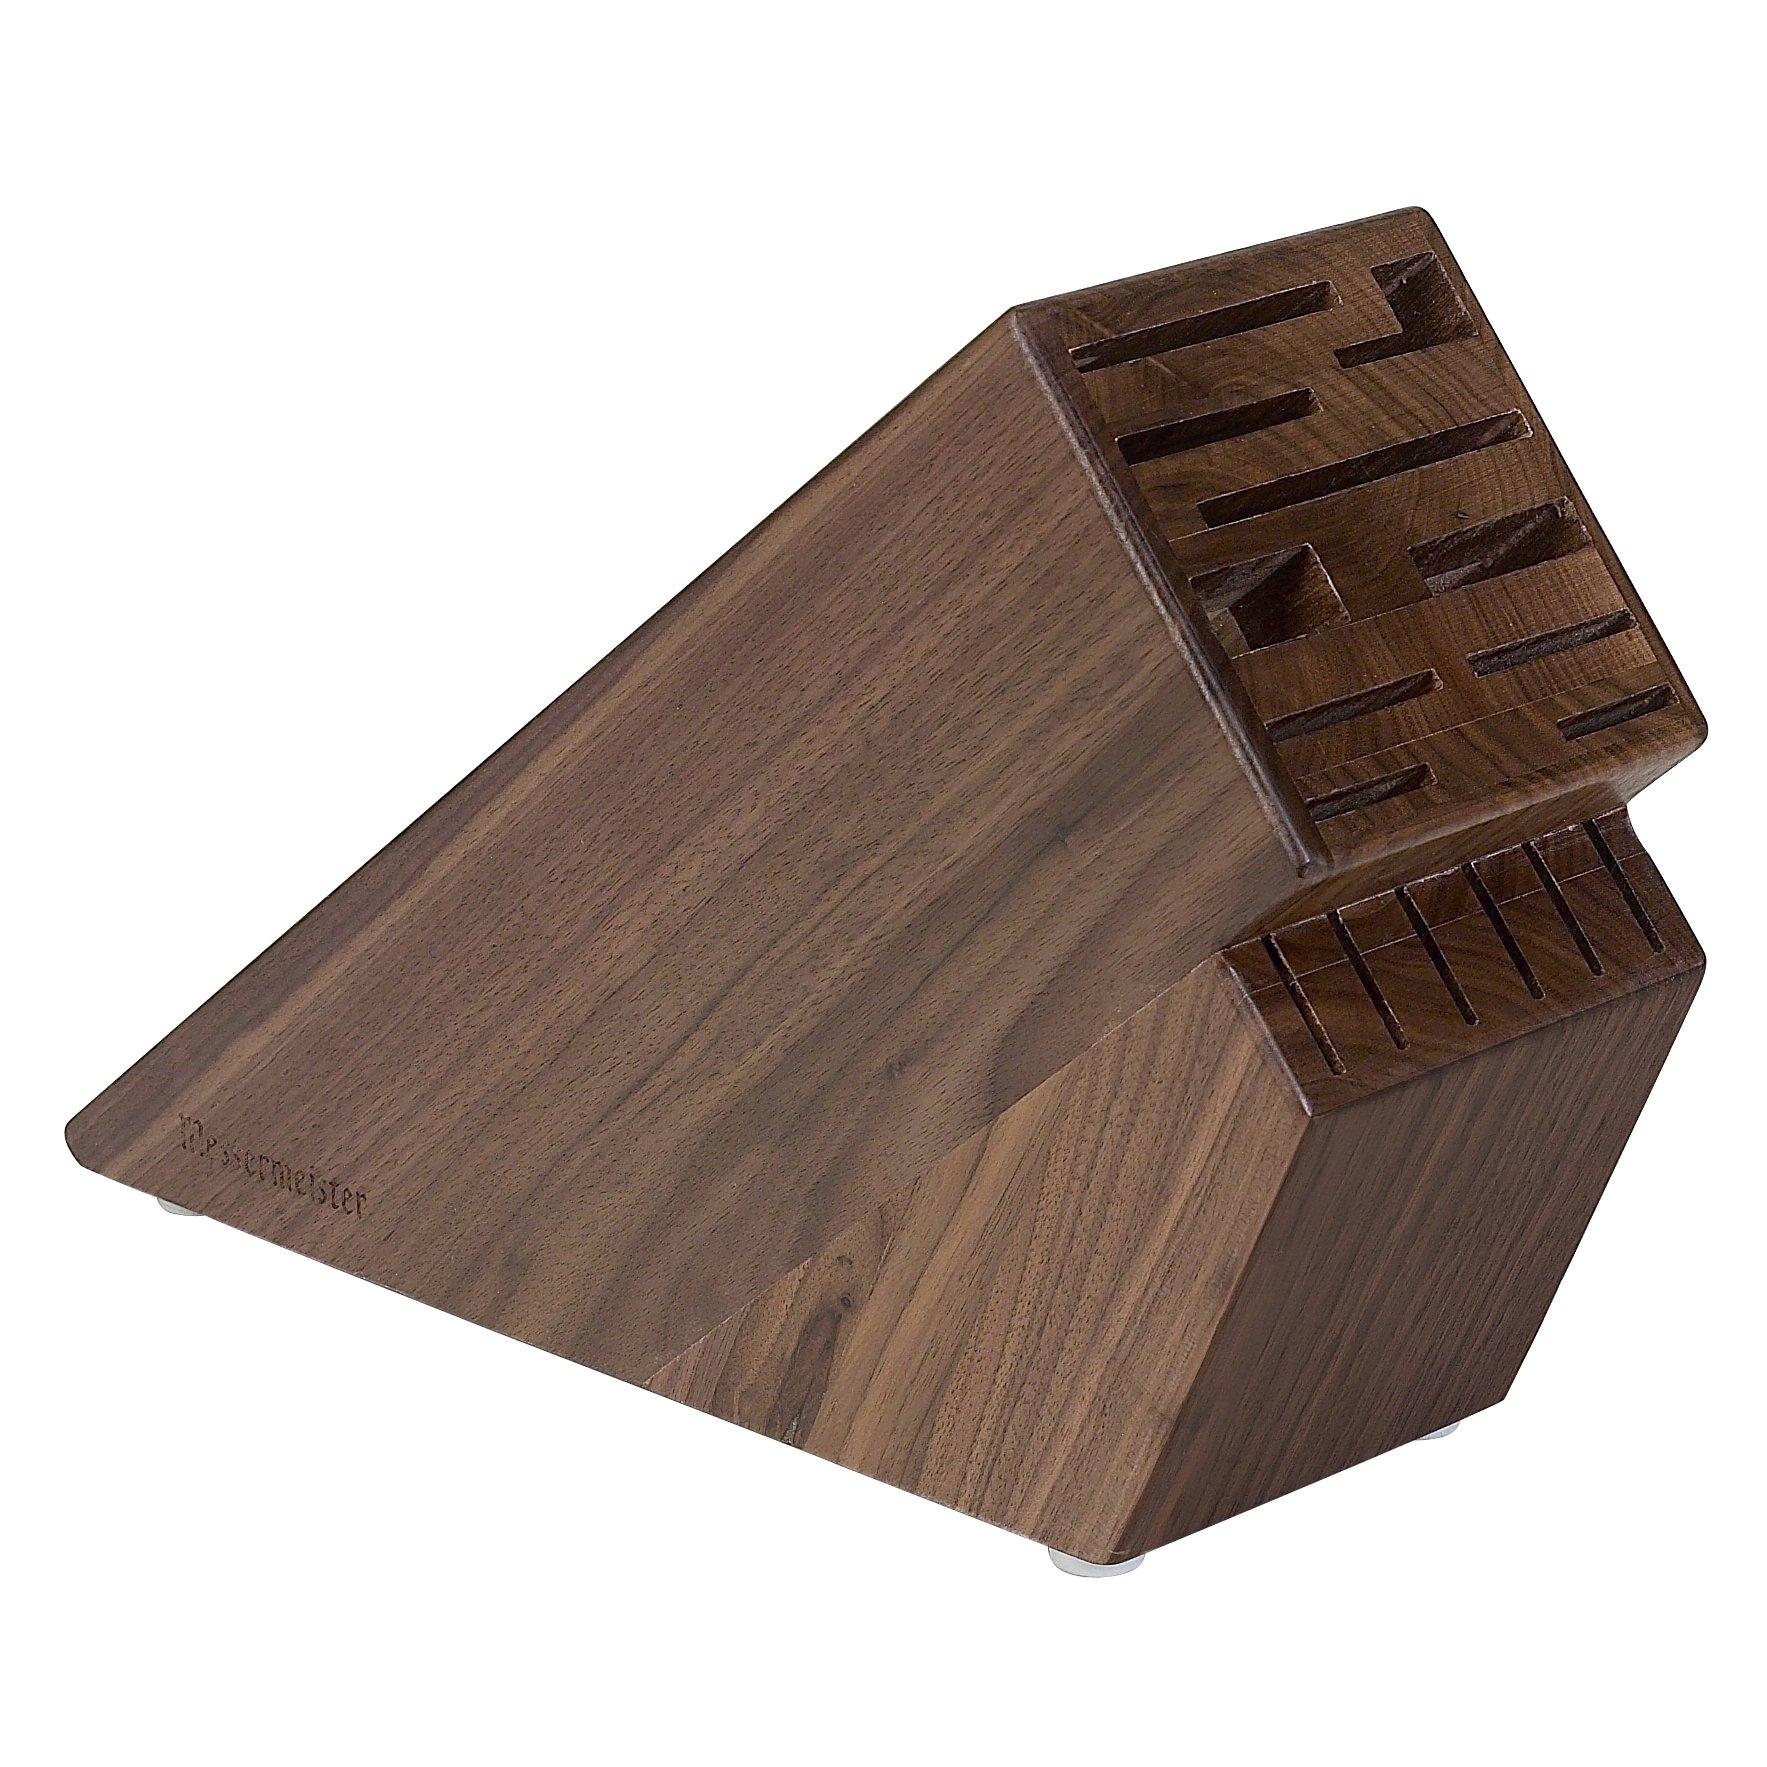 Messermeister Walnut 16 Slot Knife Block, Brown